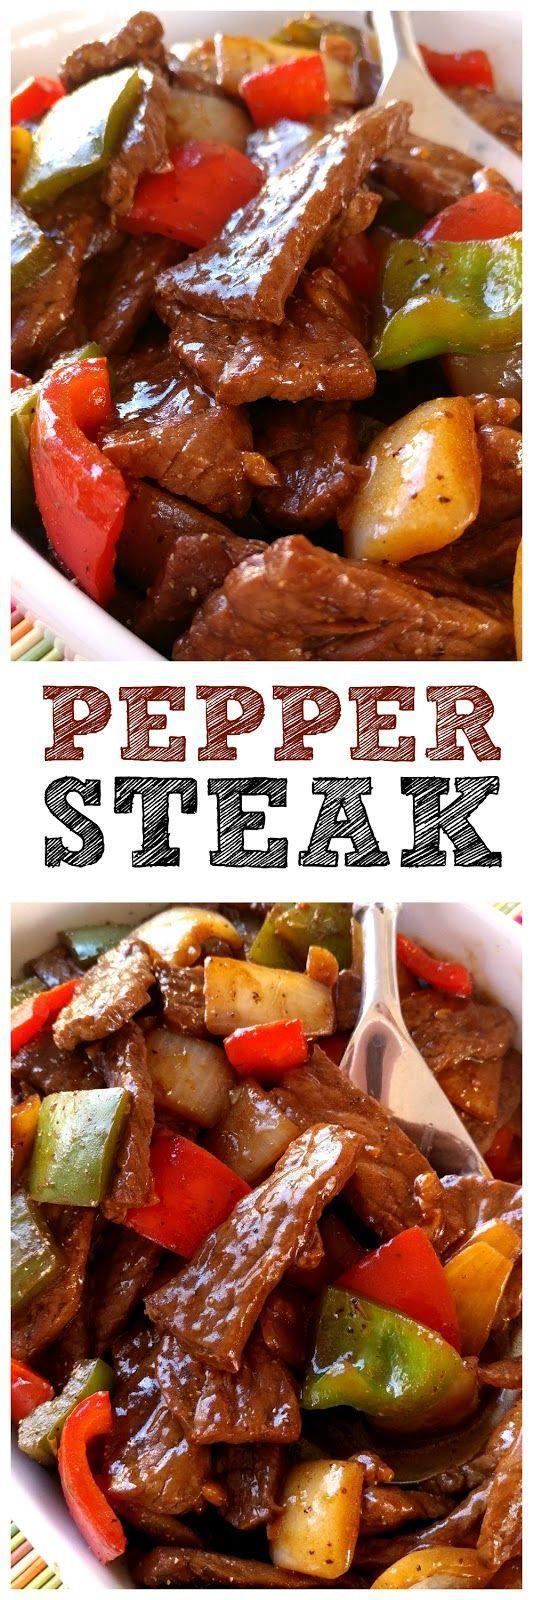 Recipes for bottom round steak